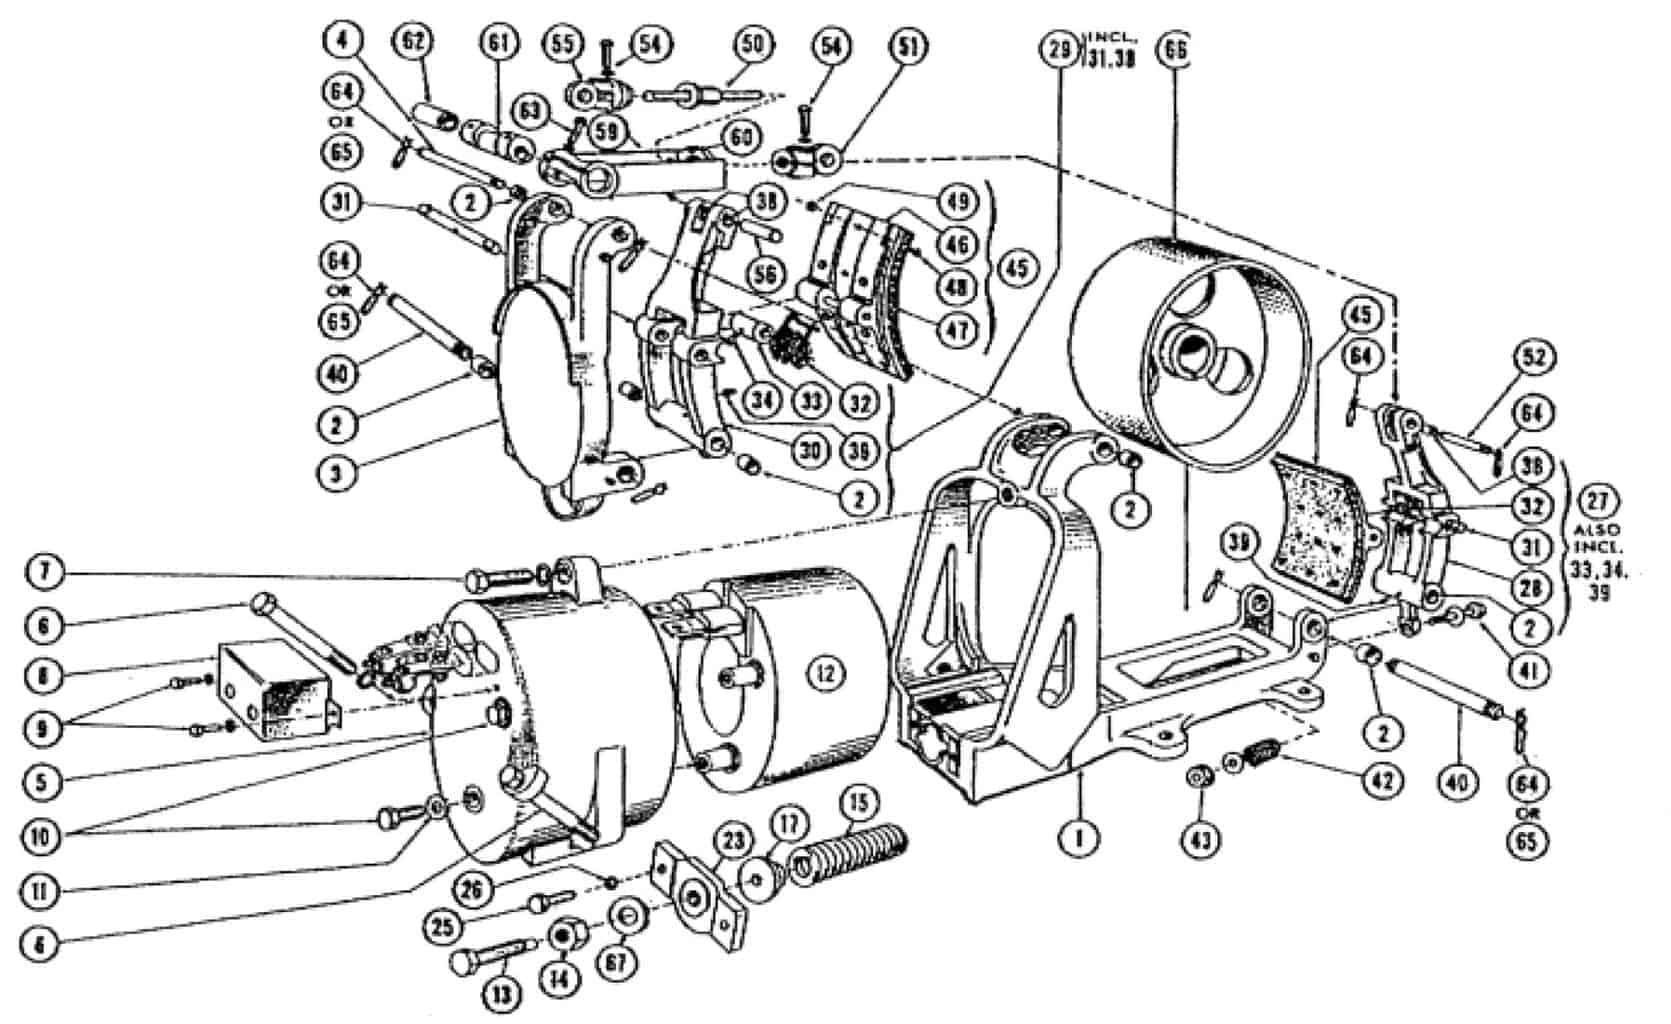 CLARK 16 DC MAGNETIC BRAKE